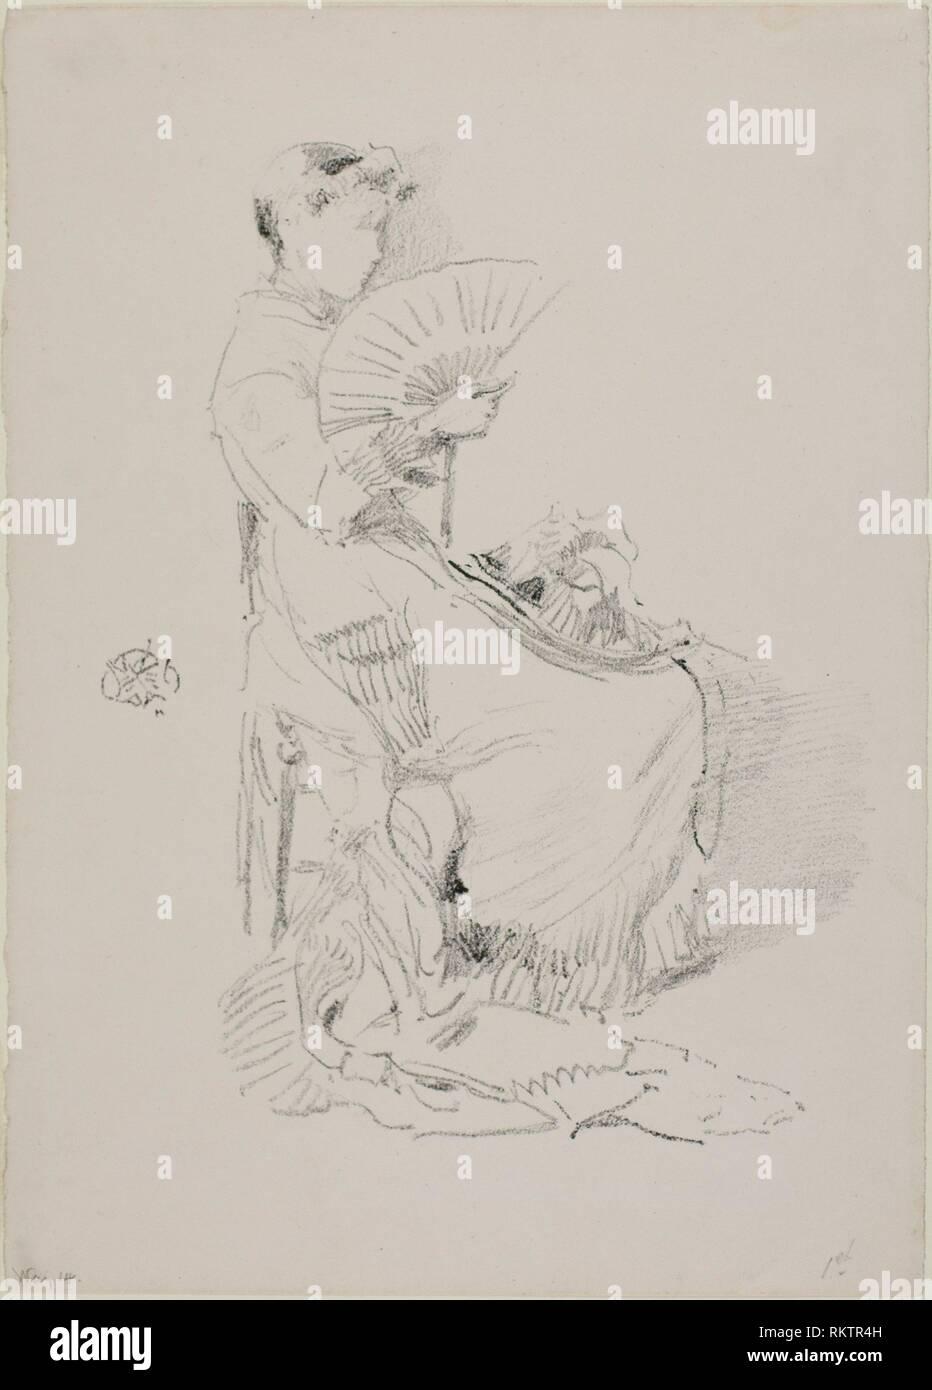 The Fan - 1879 - James McNeill Whistler American, 1834-1903 - Artist: James McNeill Whistler, Origin: United States, Date: 1879, Medium: Transfer - Stock Image